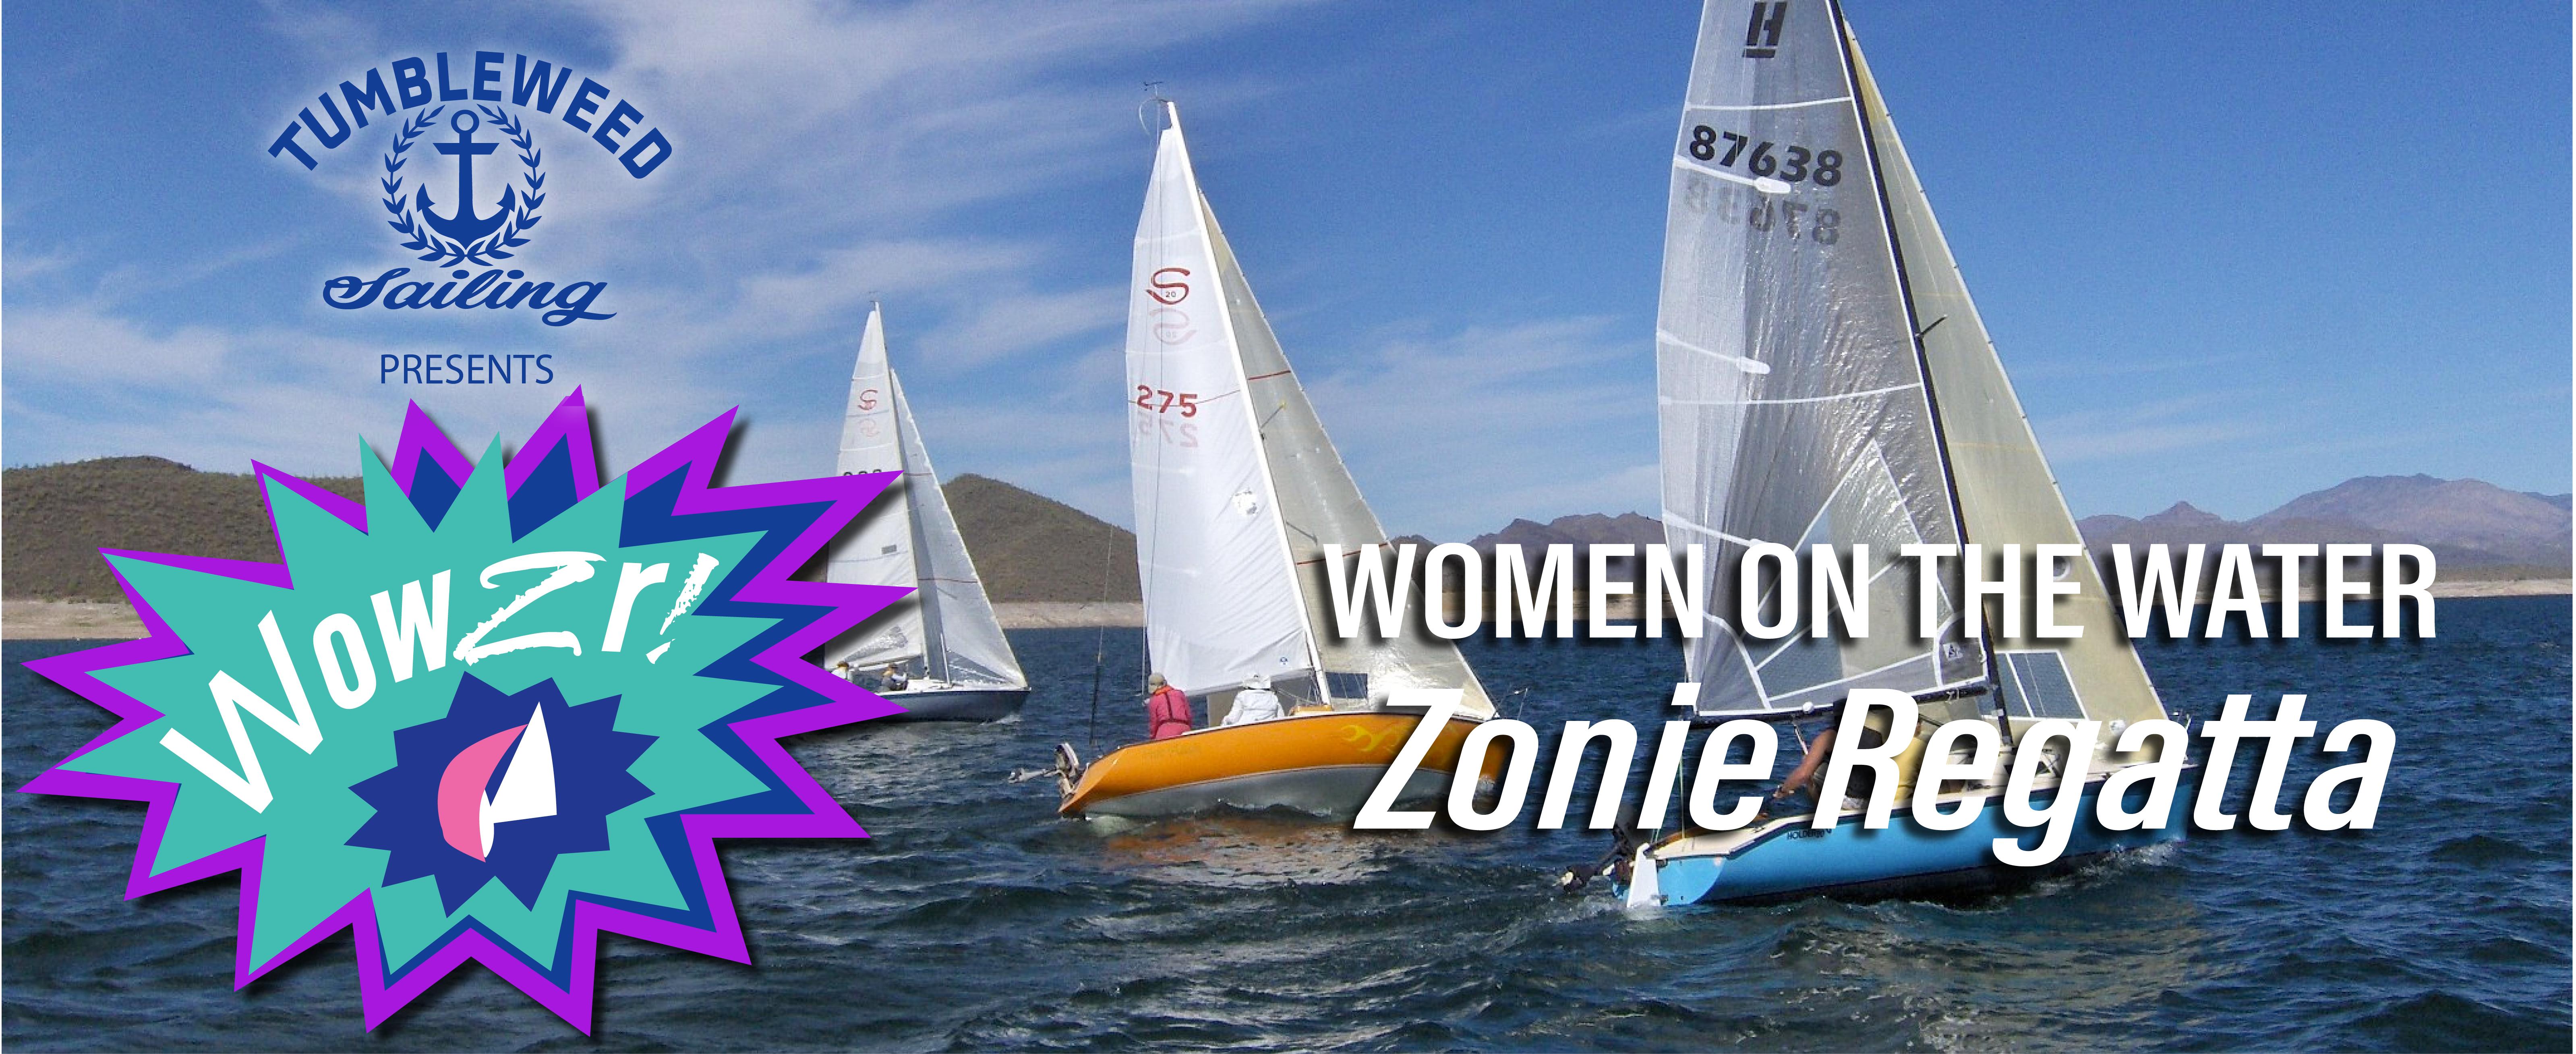 WOWZR — Women on the Water, Zonie Regatta | Women's Sailing